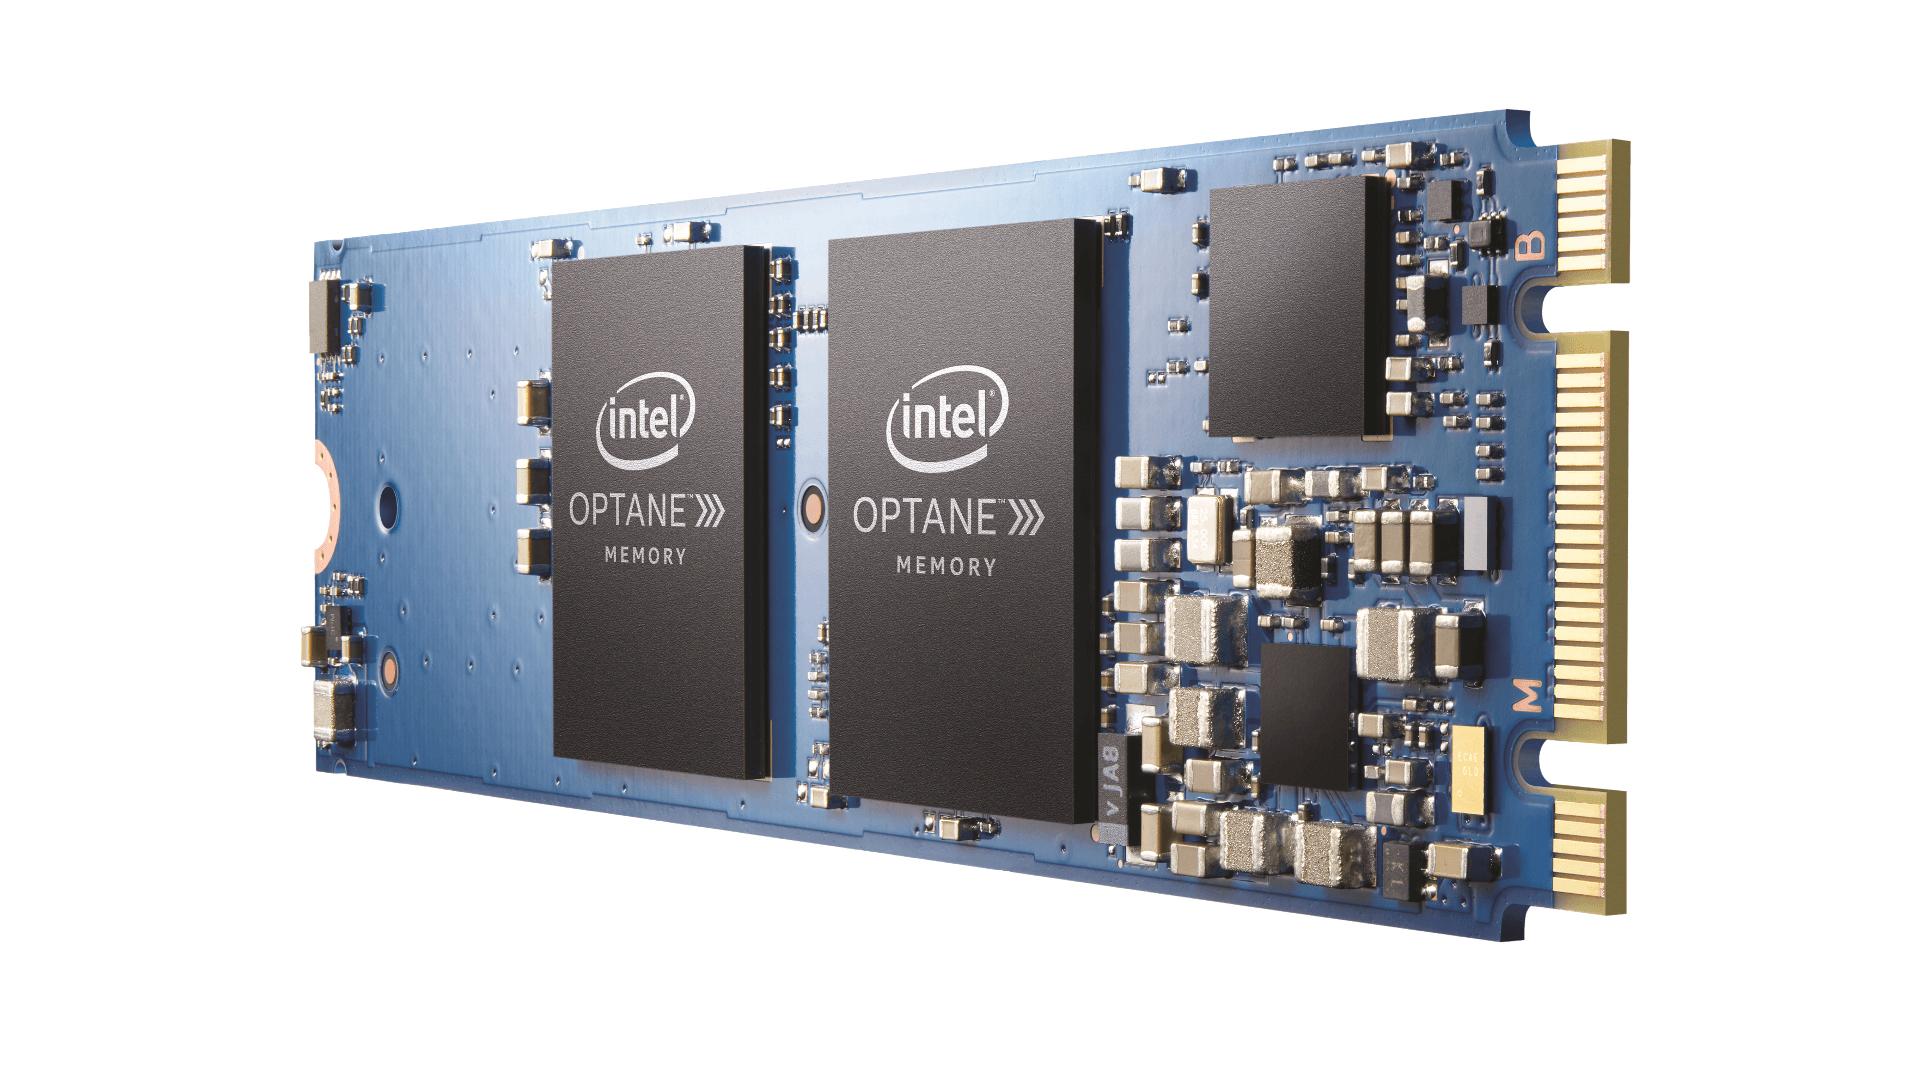 Intel Optane MEMPEK1J032GA01 unidad de estado sólido M.2 32 GB PCI Express 3.0 3D Xpoint NVMe